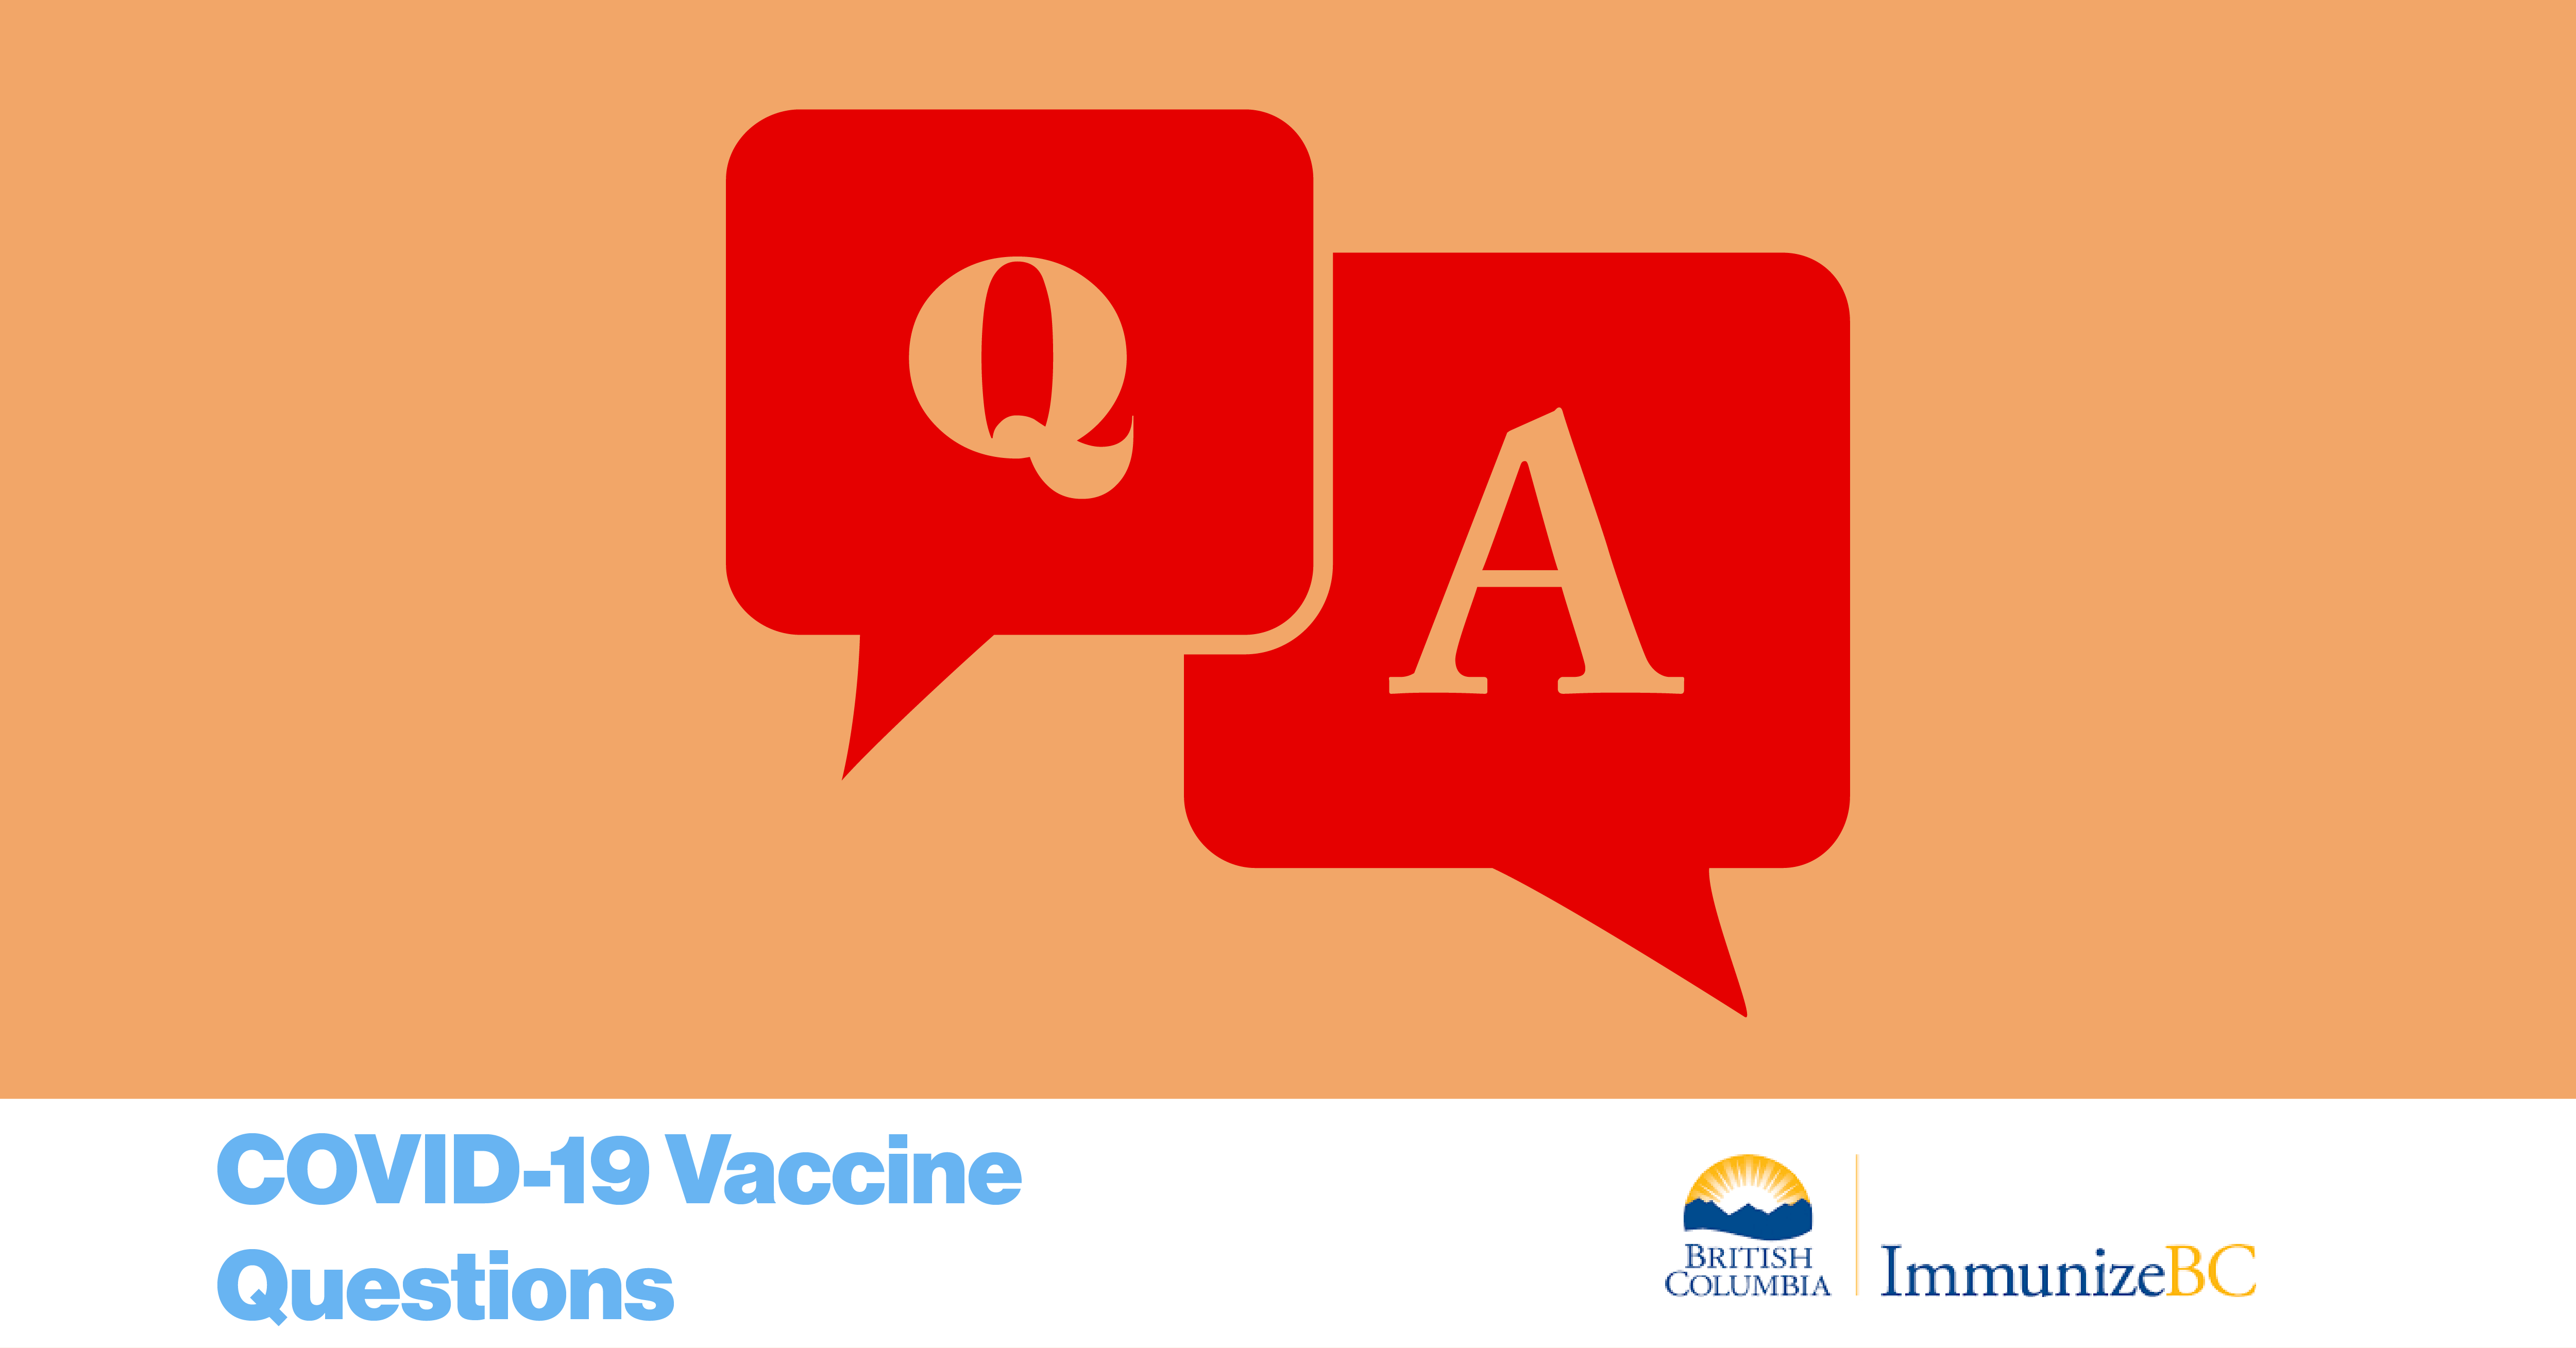 immunizebc.ca